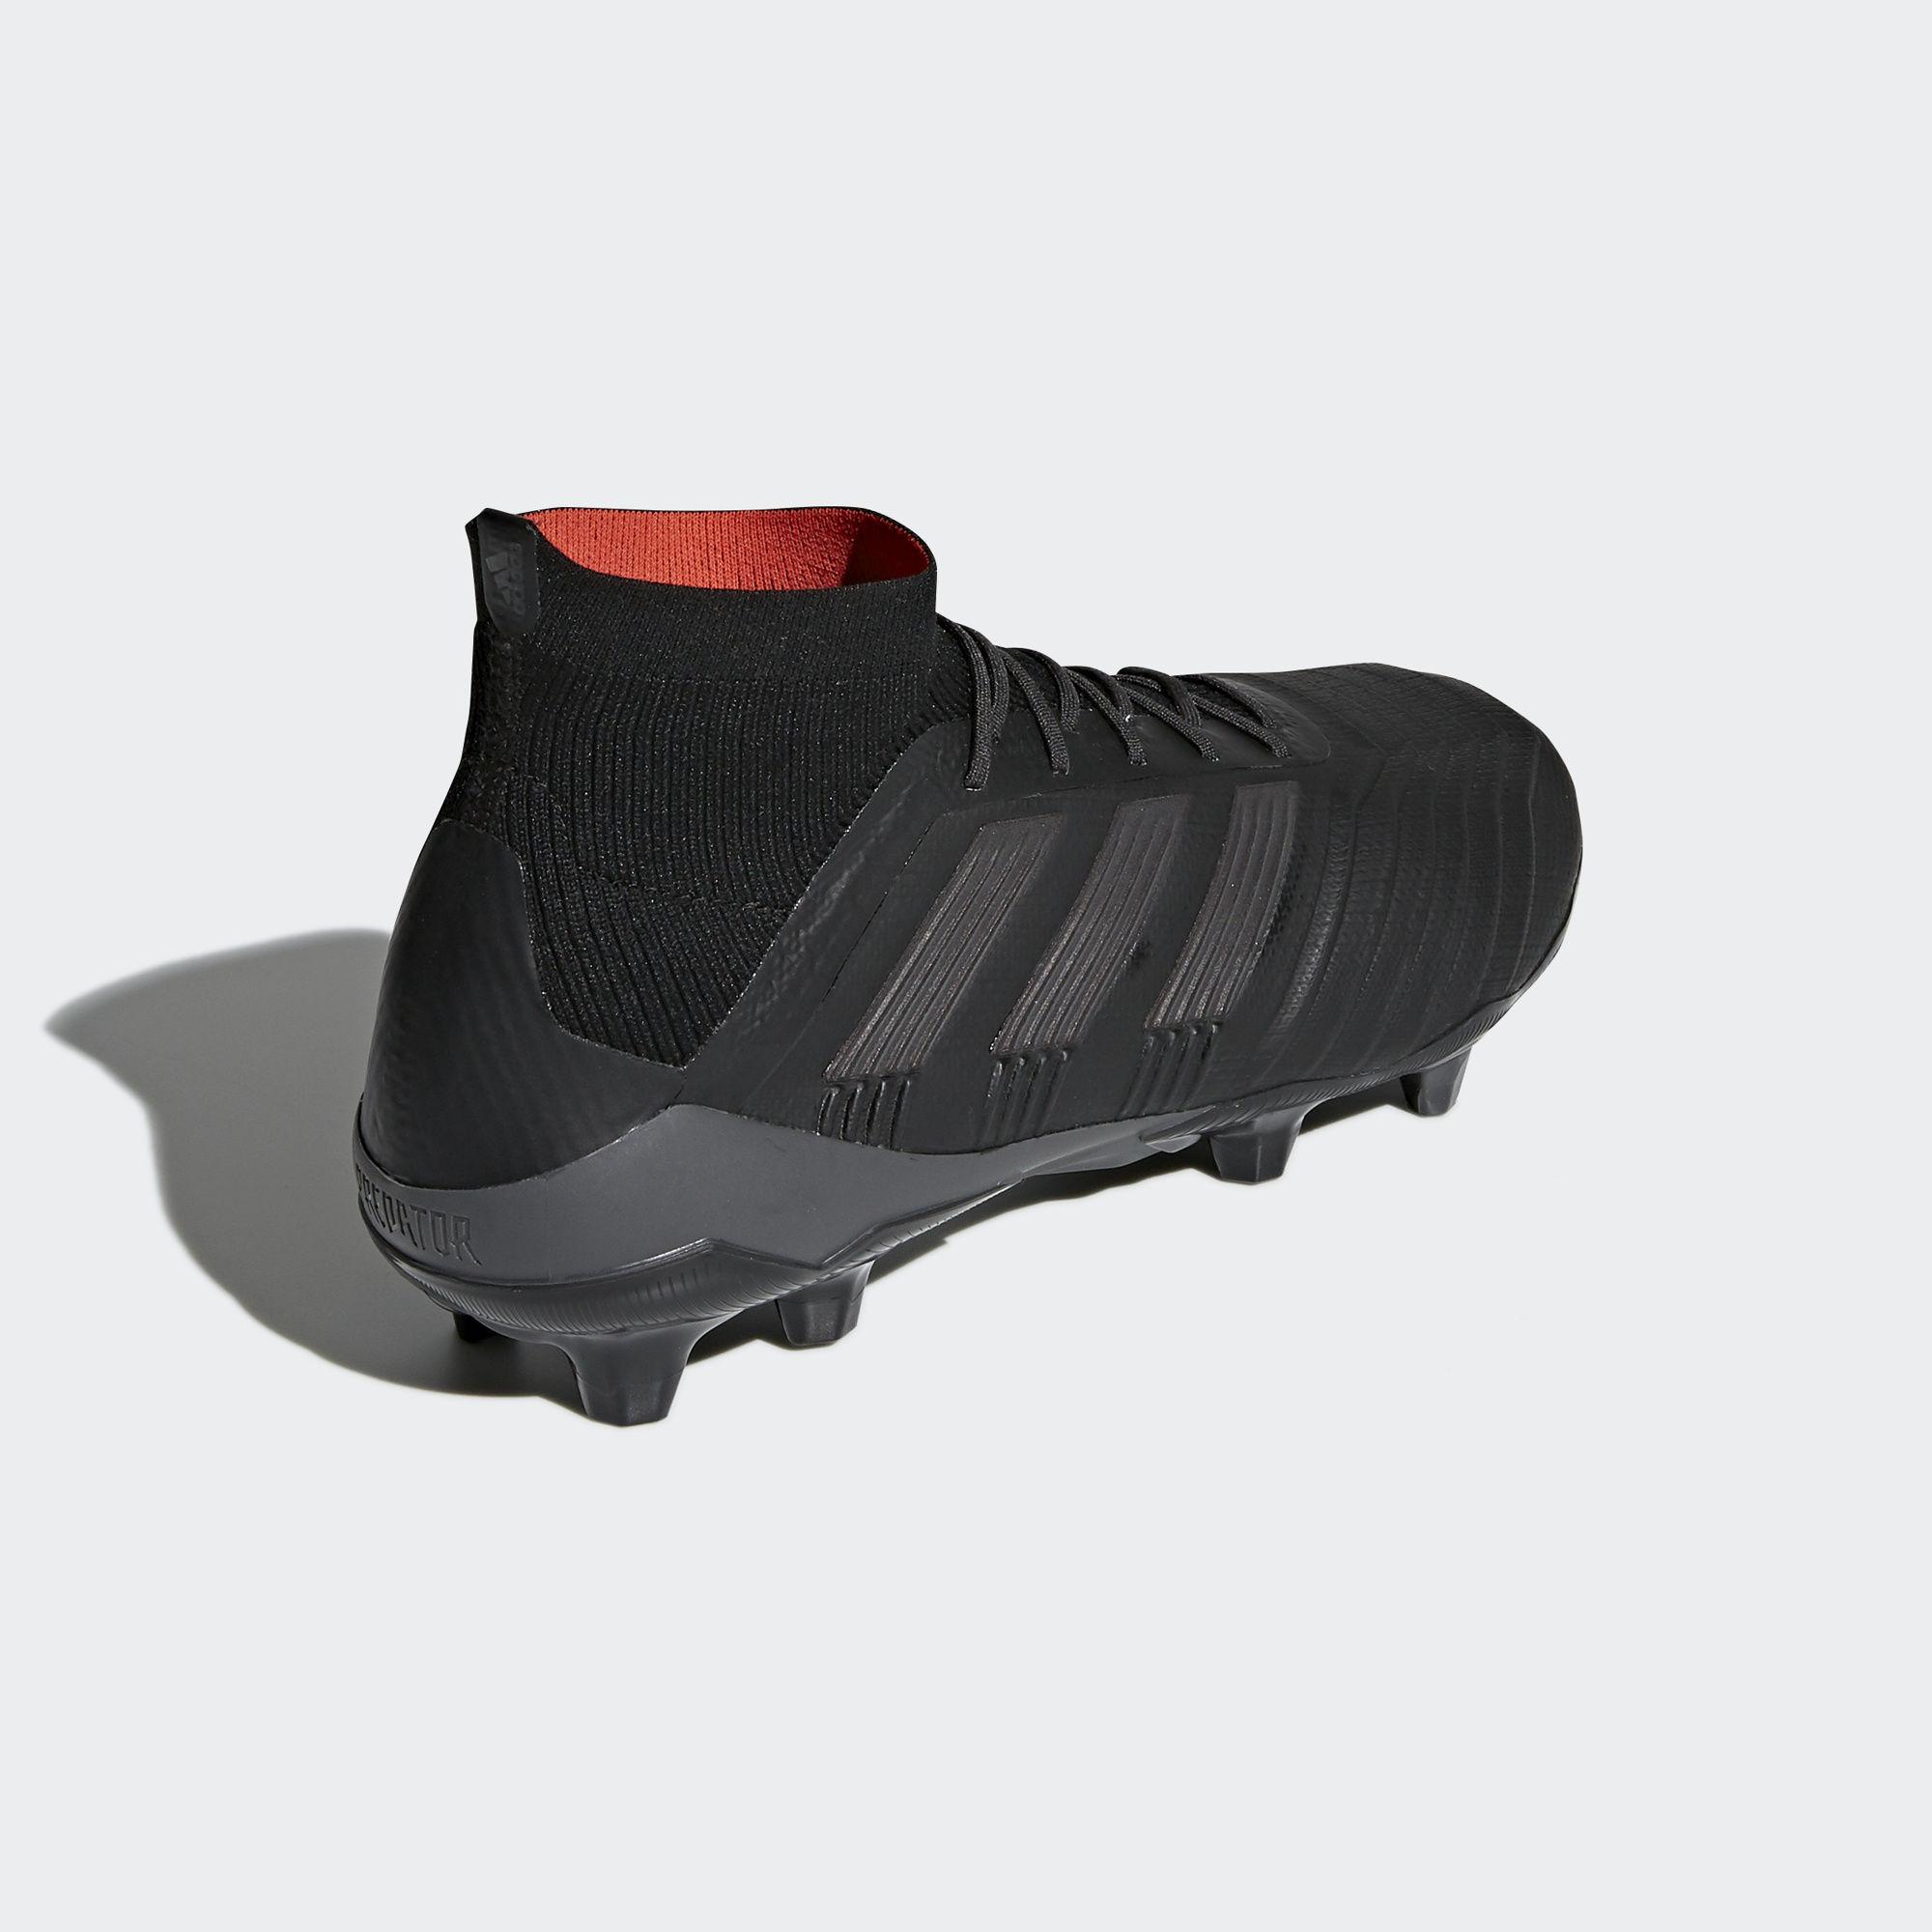 95931de26046 ... Click to enlarge image  adidas_predator_18.1_fg_nite_crawler_core_black_core_black_real_coral_e.jpg  ...